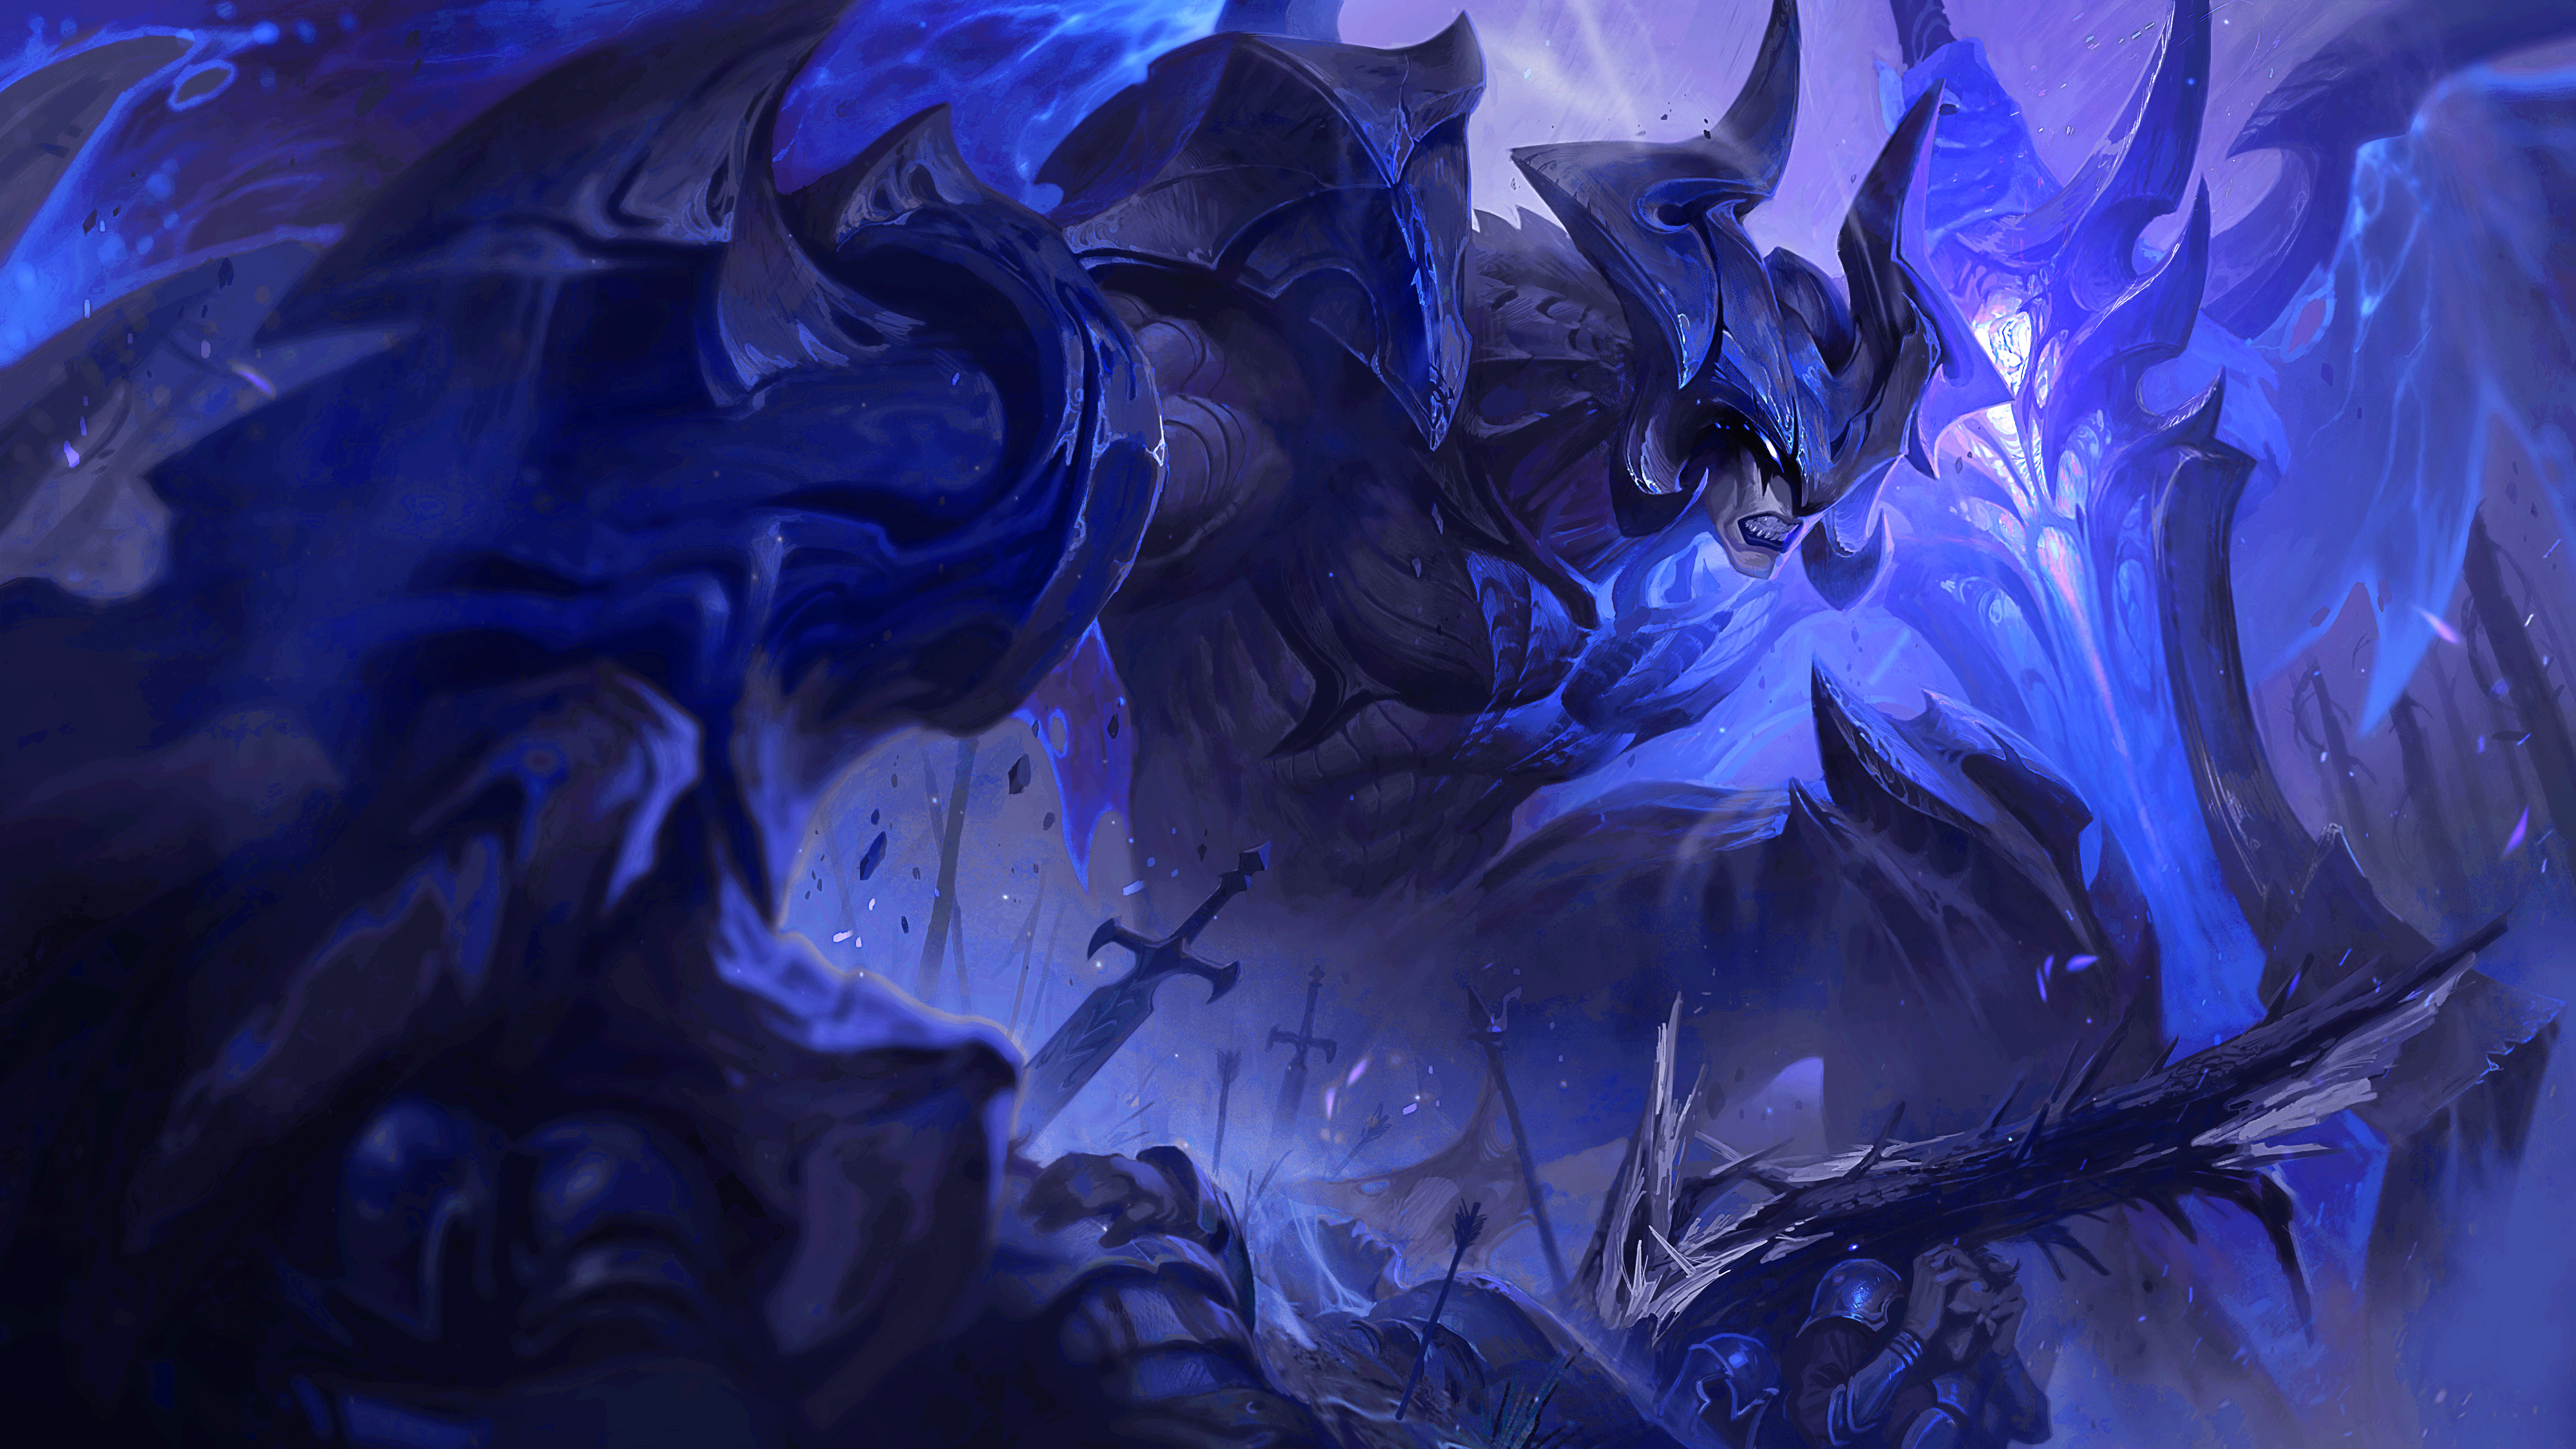 Aatrox League Of Legends League Of Legends 4000x2250